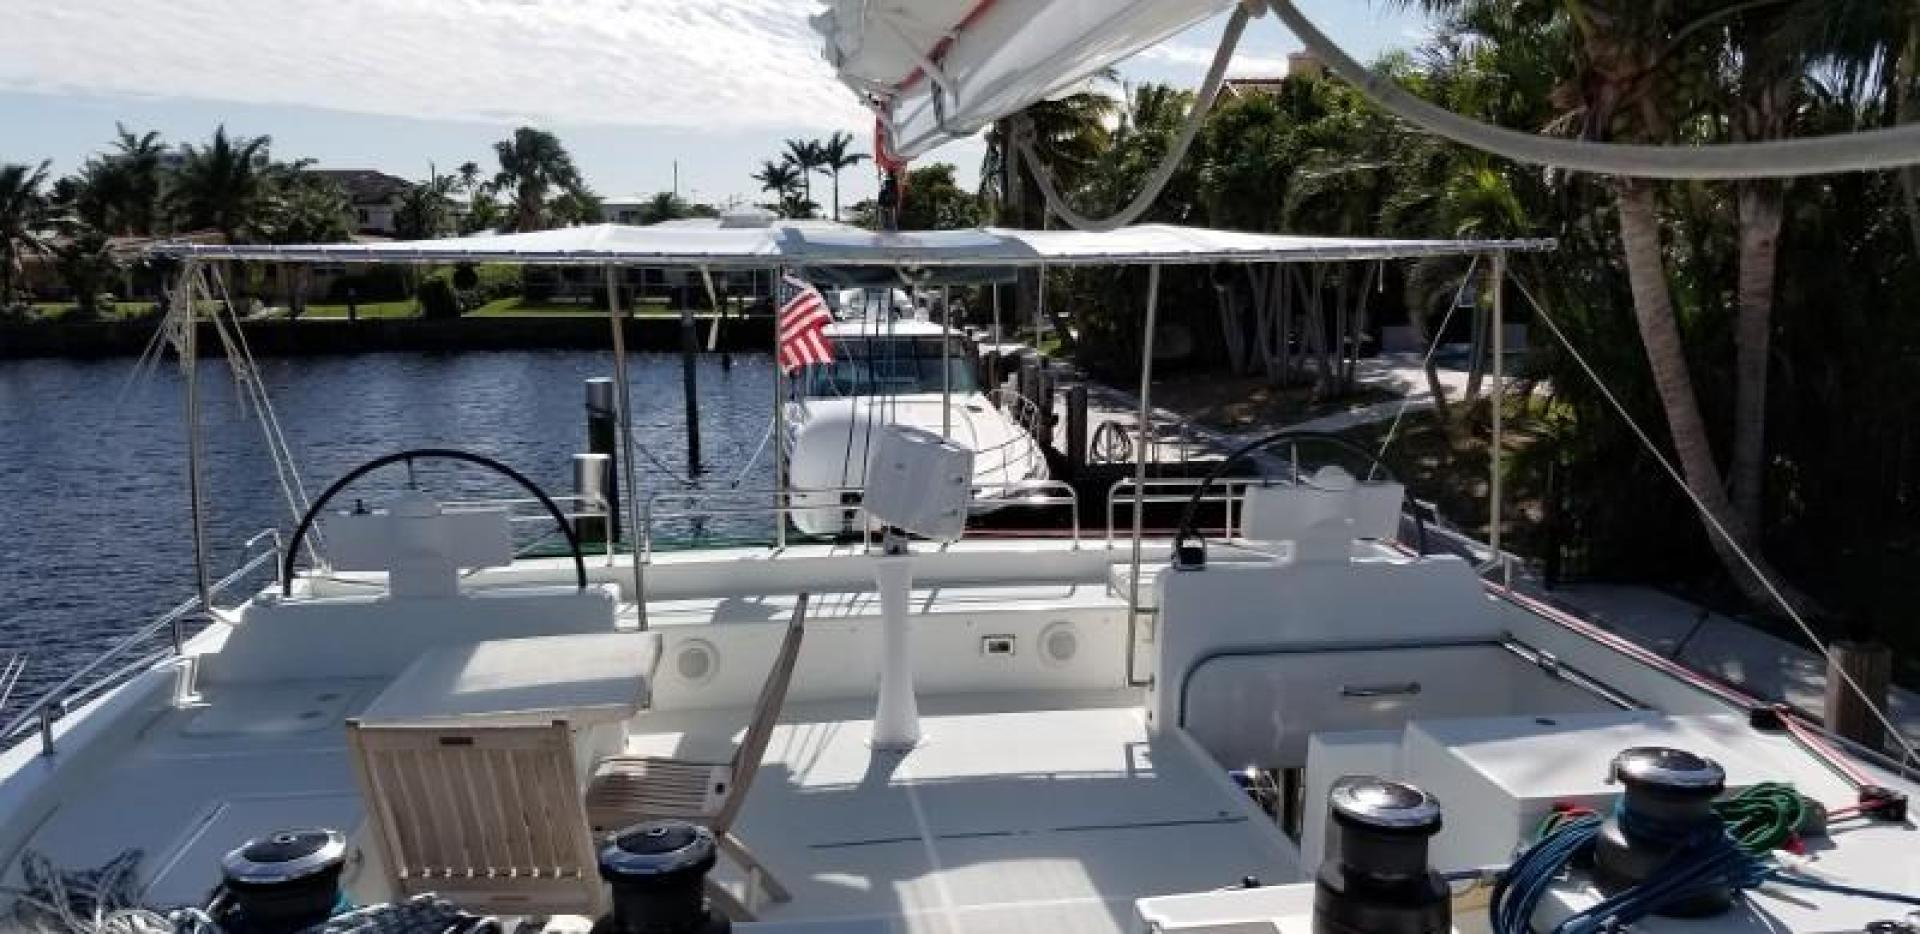 Lagoon-620 2011-Princess Hera Fort Lauderdale-Florida-United States-303808 | Thumbnail